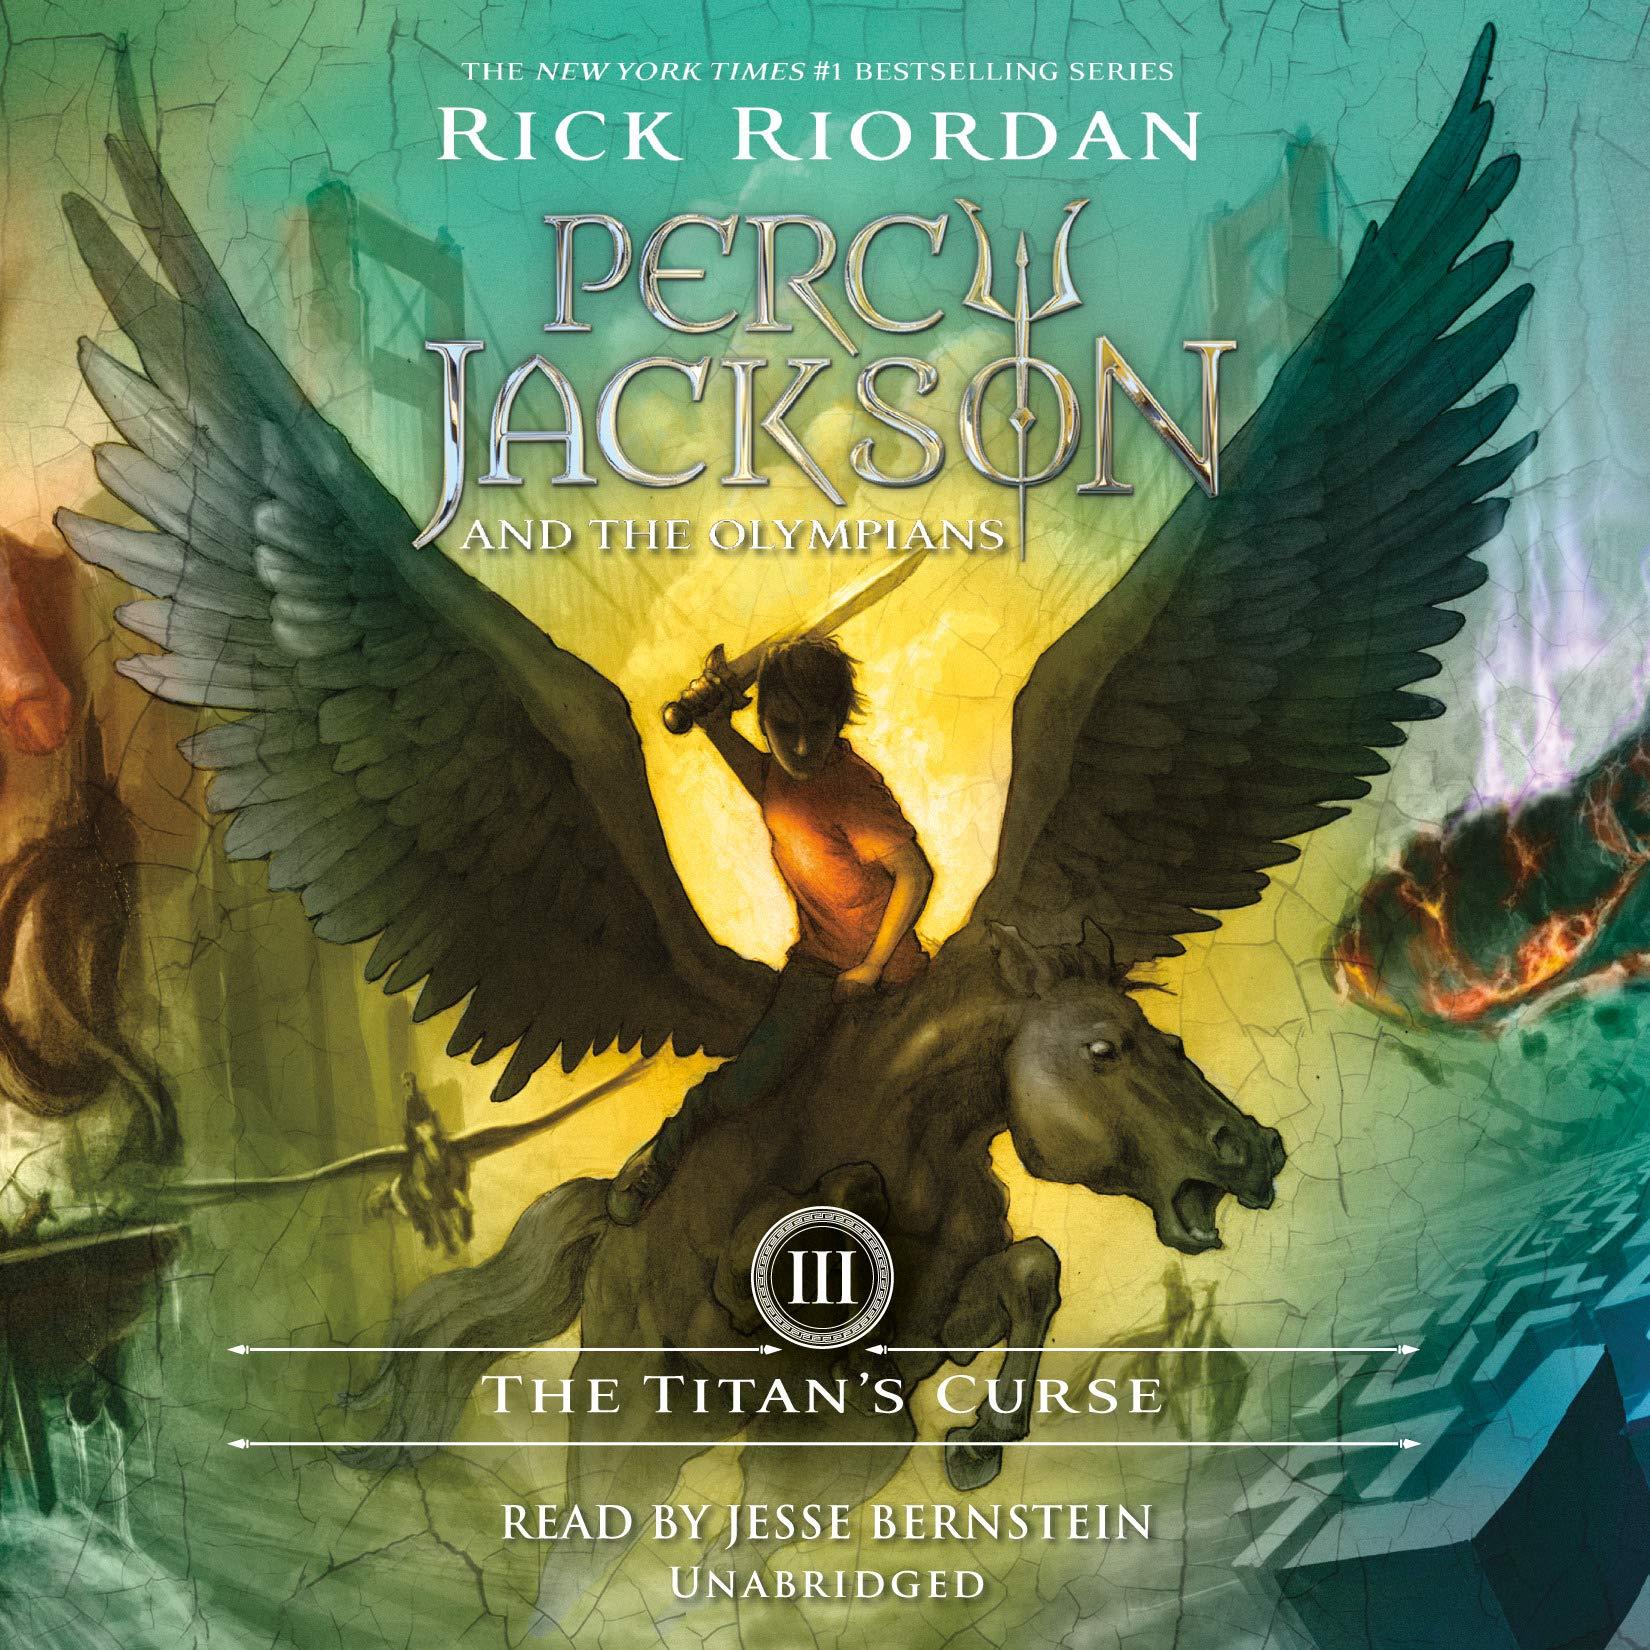 The Titans Curse: Percy Jackson and the Olympians: Book 3: Amazon.es: Riordan, Rick, Bernstein, Jesse: Libros en idiomas extranjeros